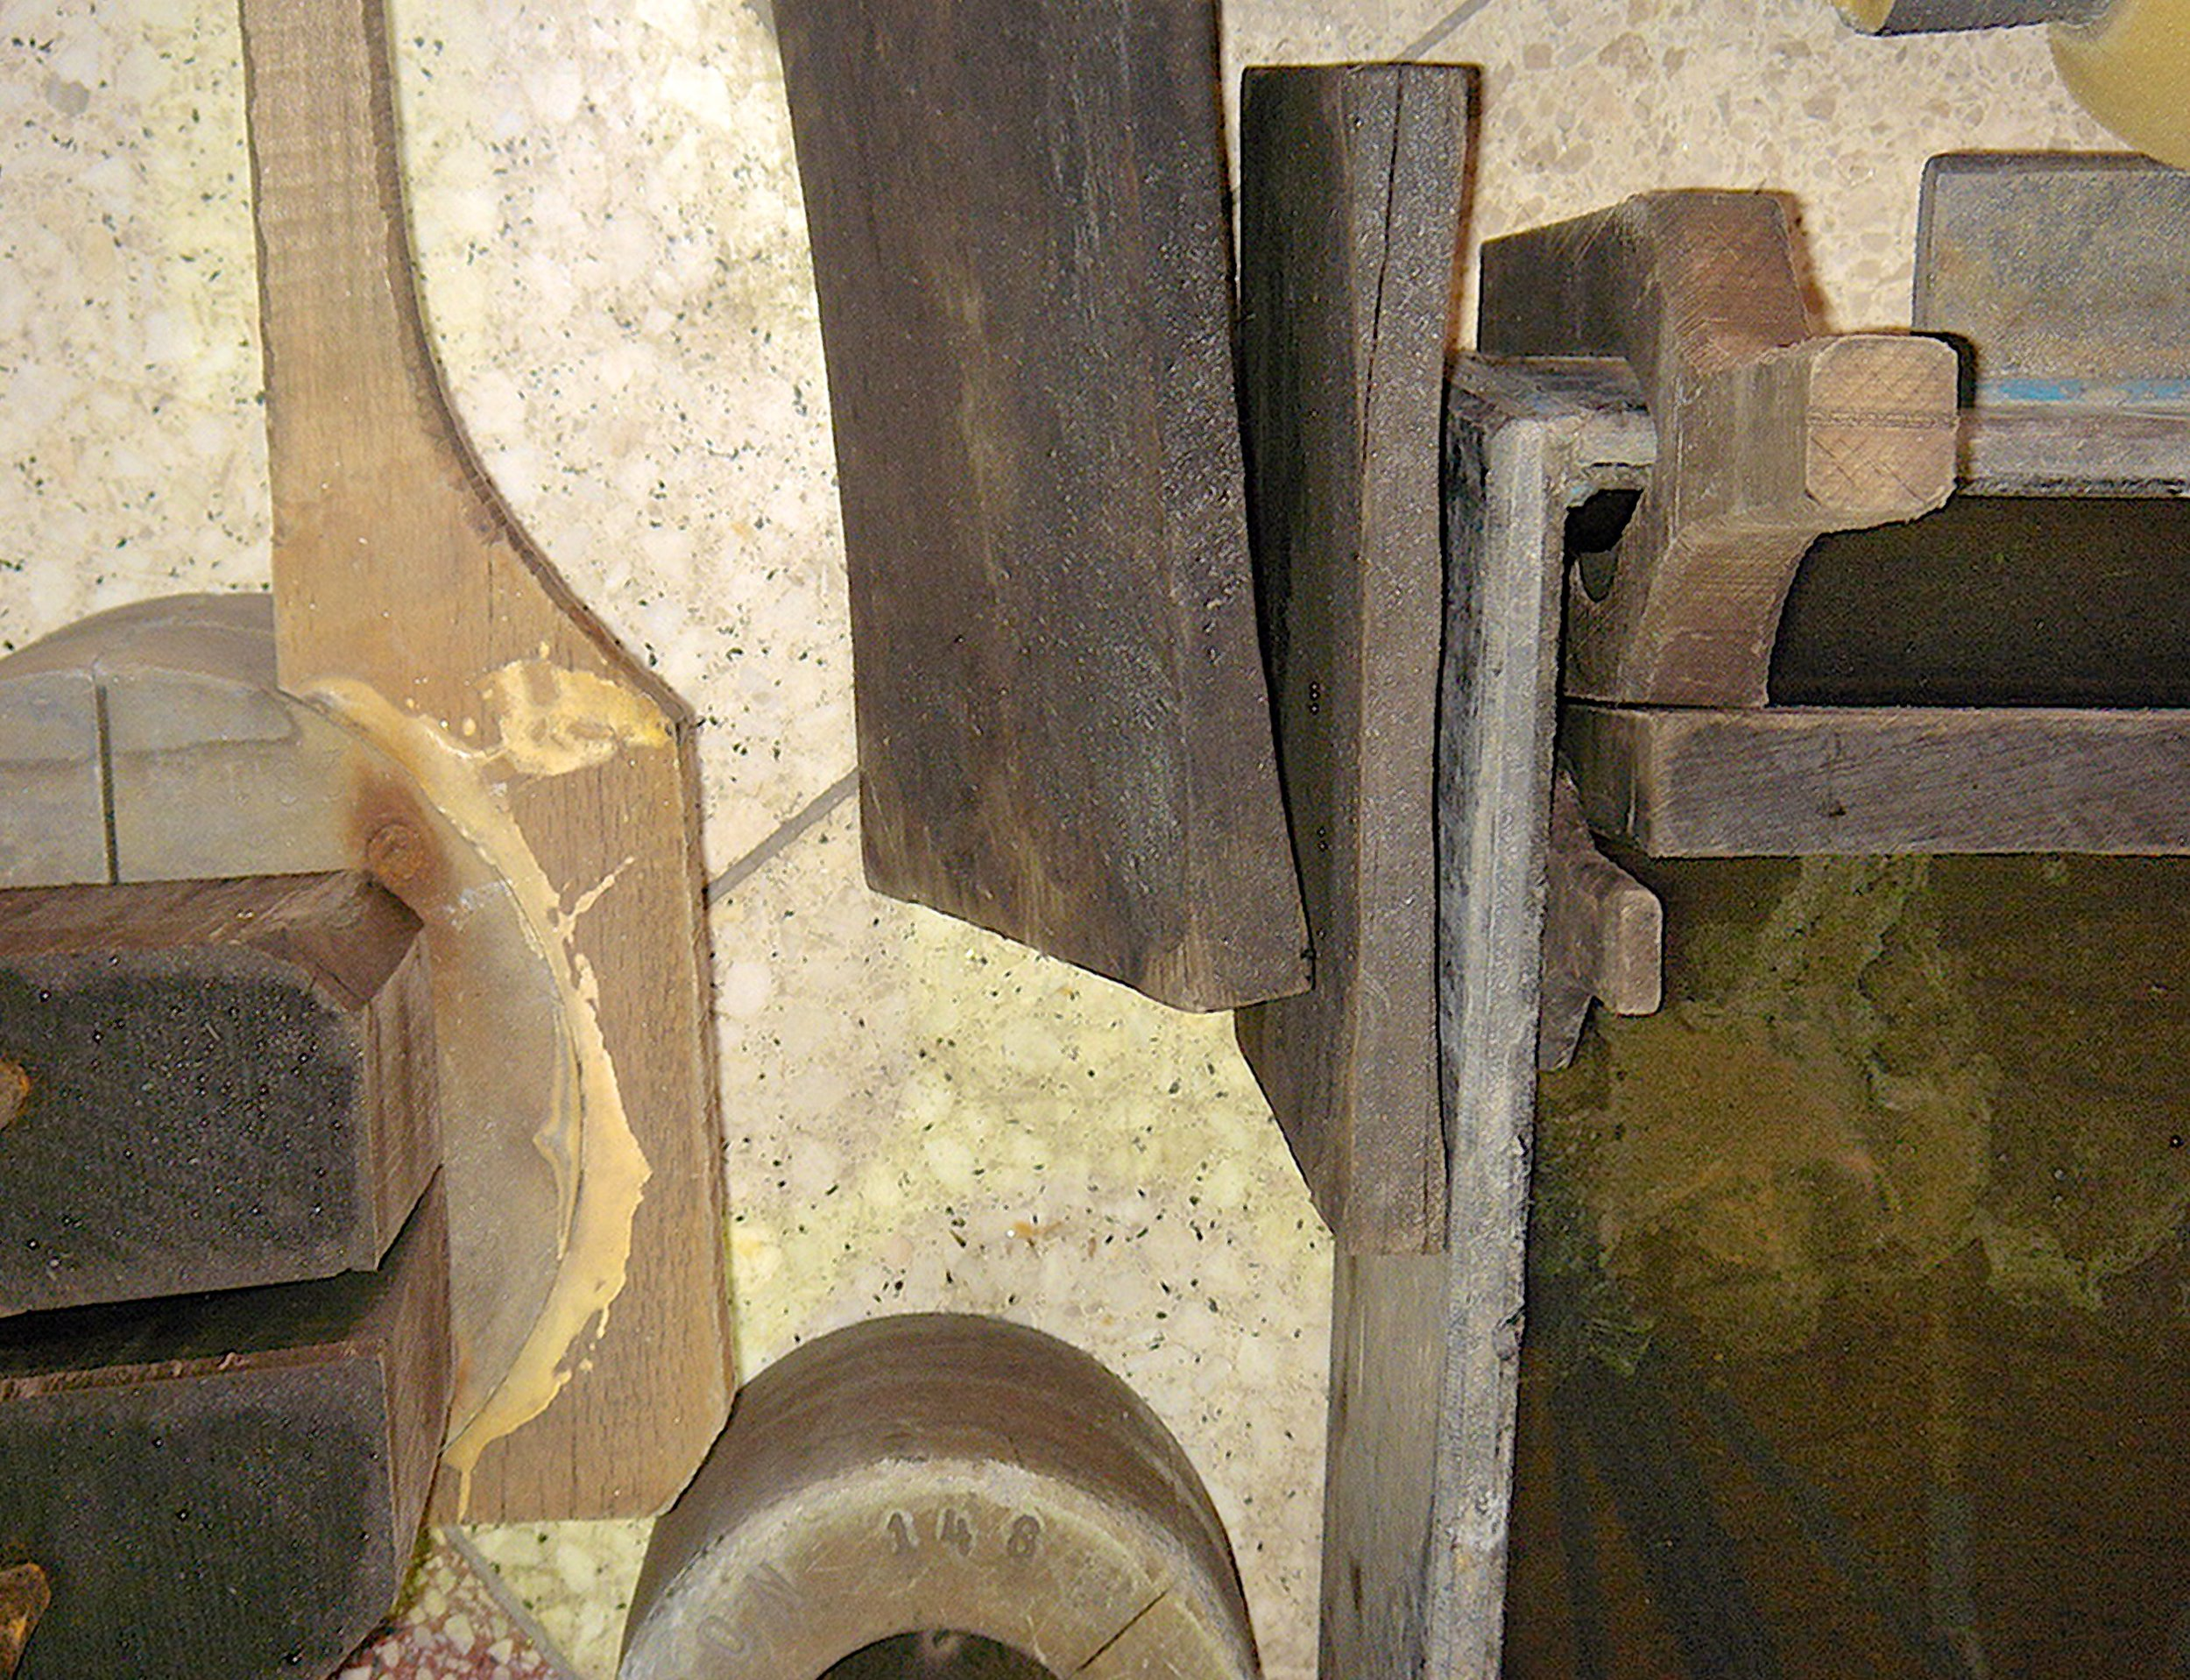 Morandi Revisited